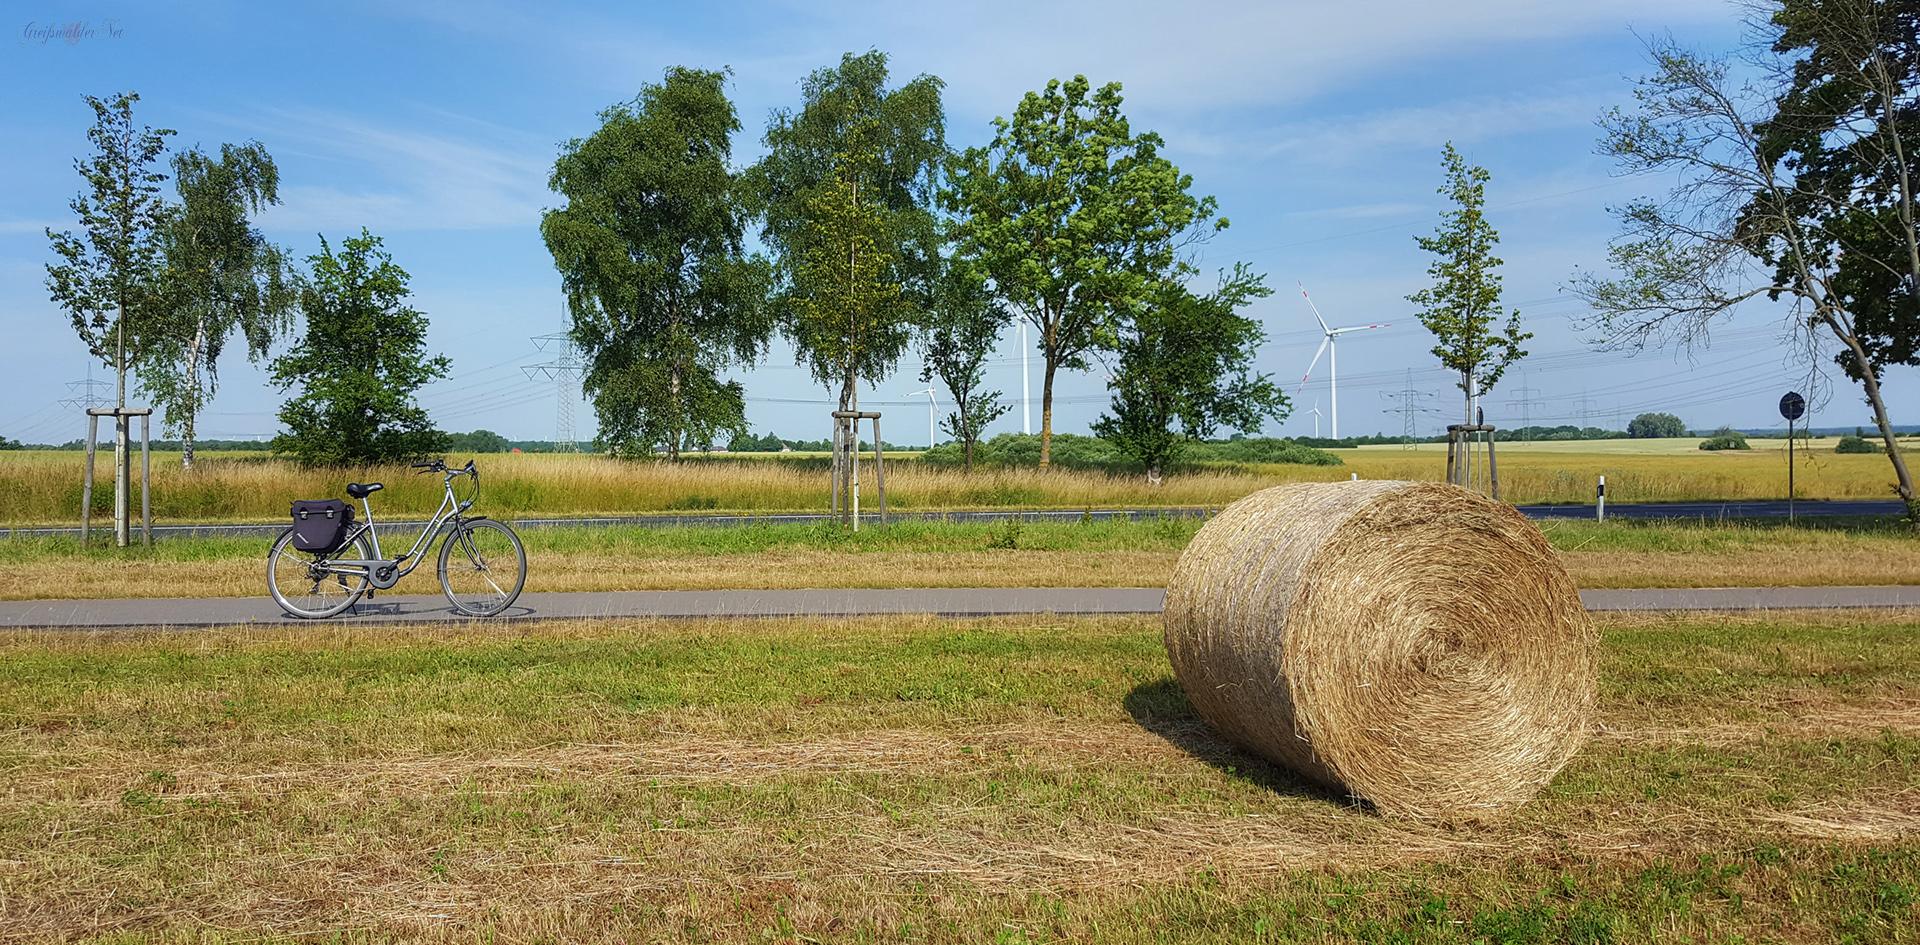 Radtour in der Natur